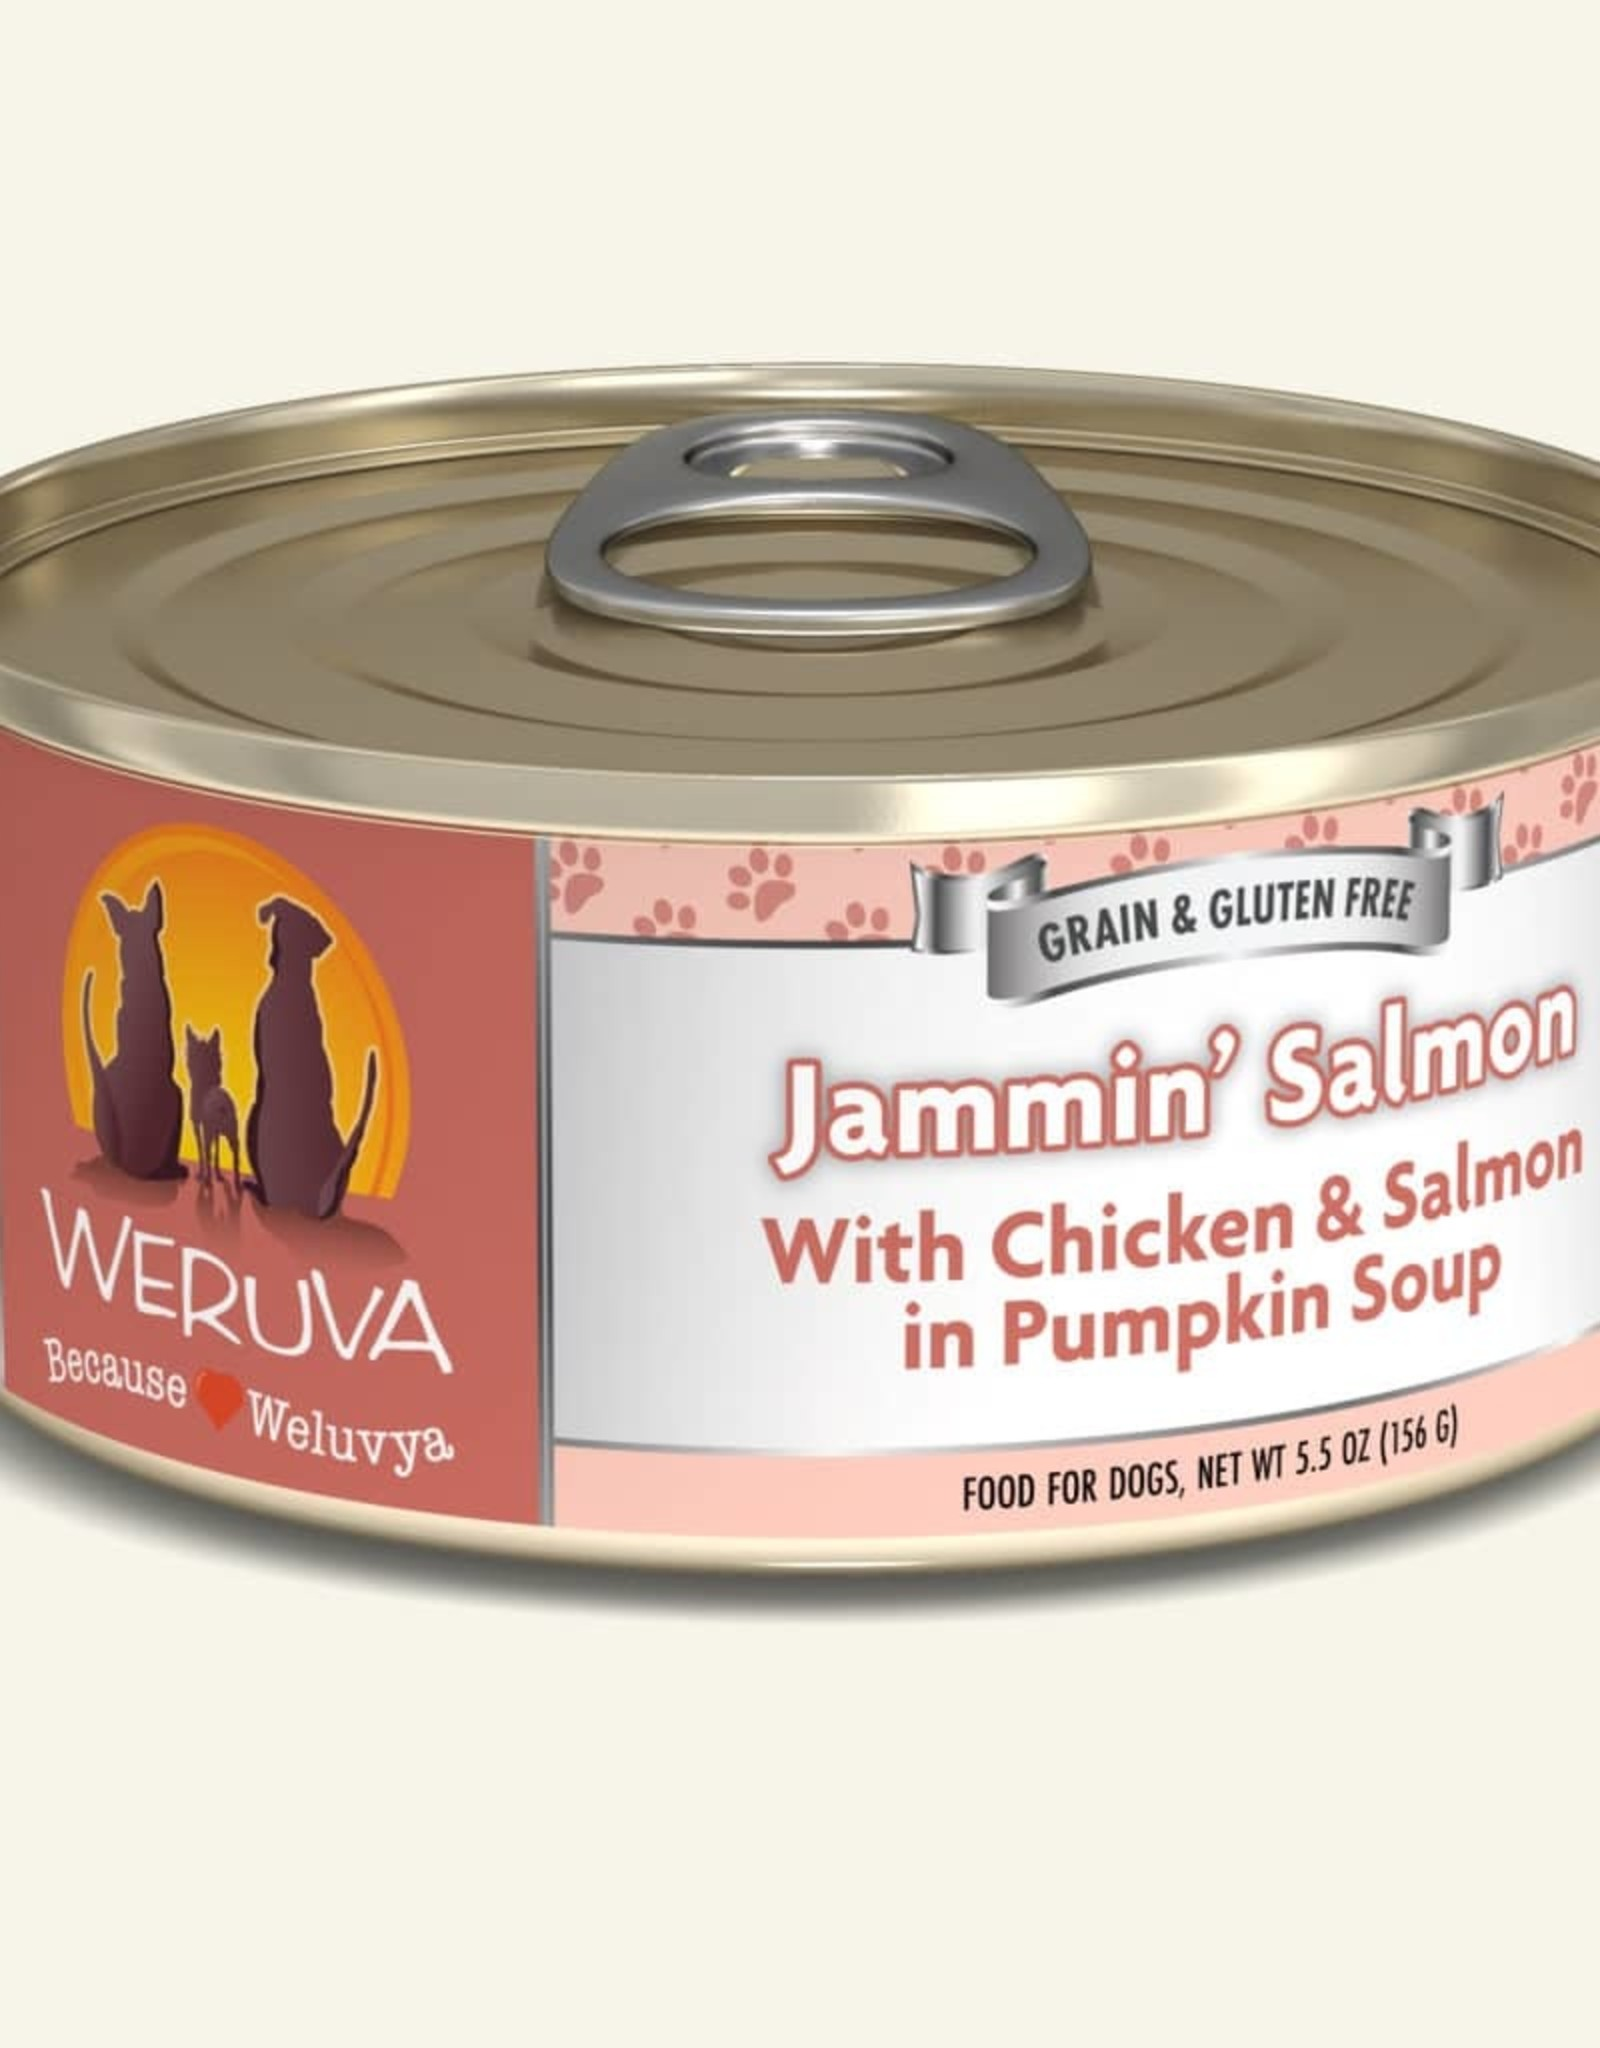 WERUVA Dog Jammin' Salmon Stew - Grain-Free 5.5oz